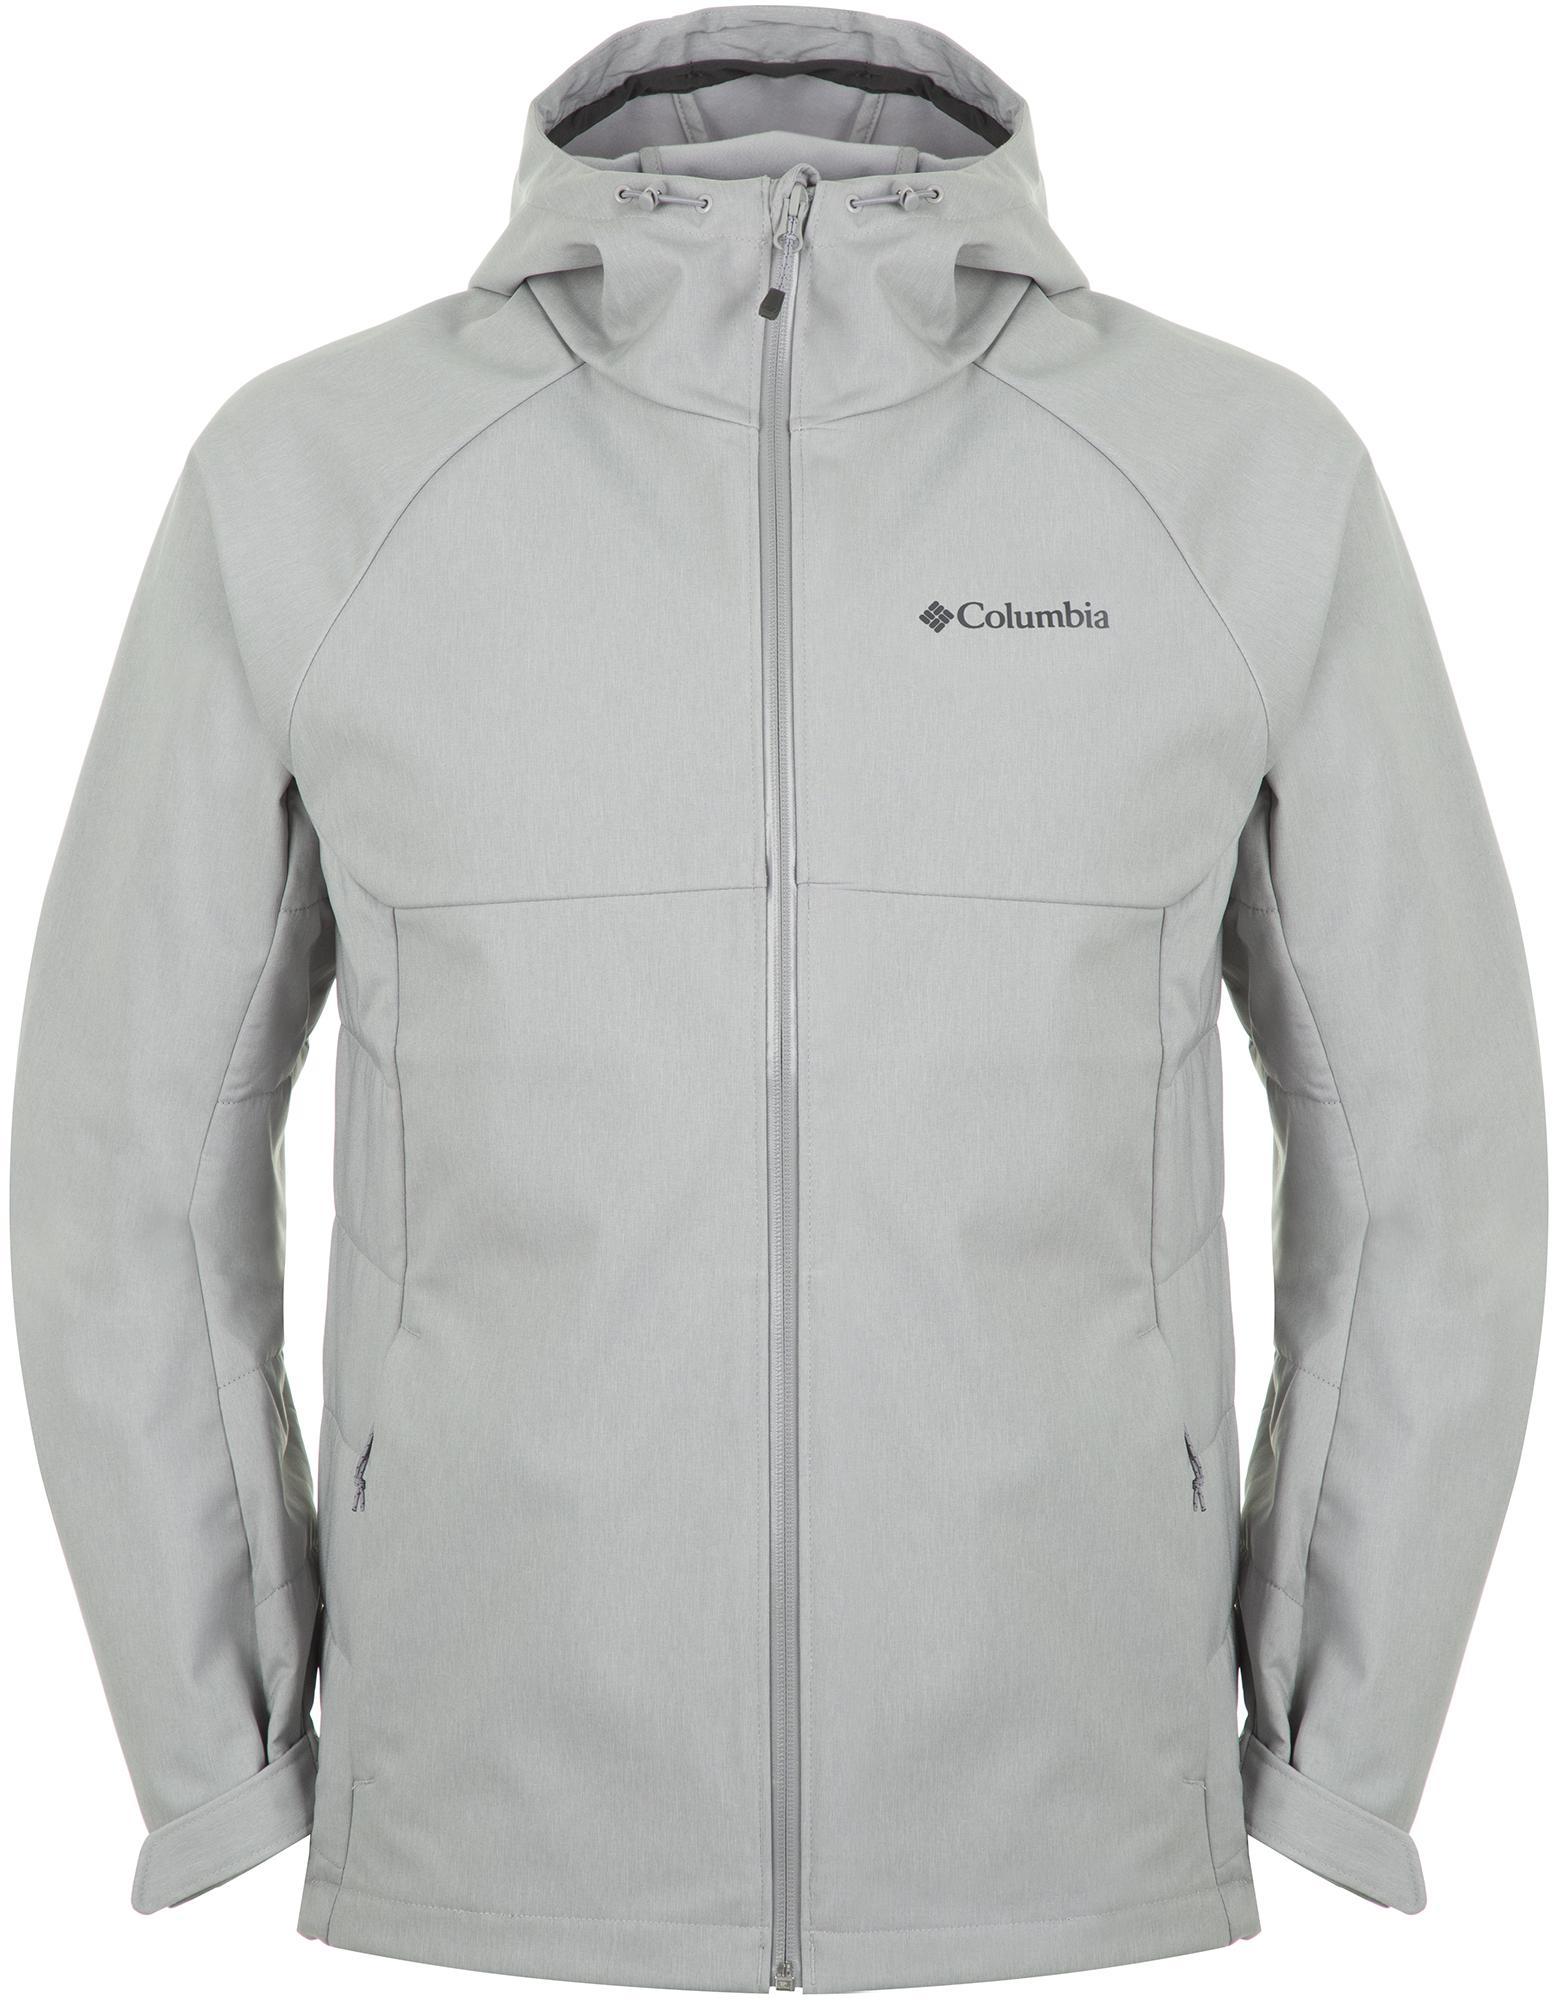 Columbia Куртка утепленная мужская Columbia Baltic Point, размер 54 цена и фото